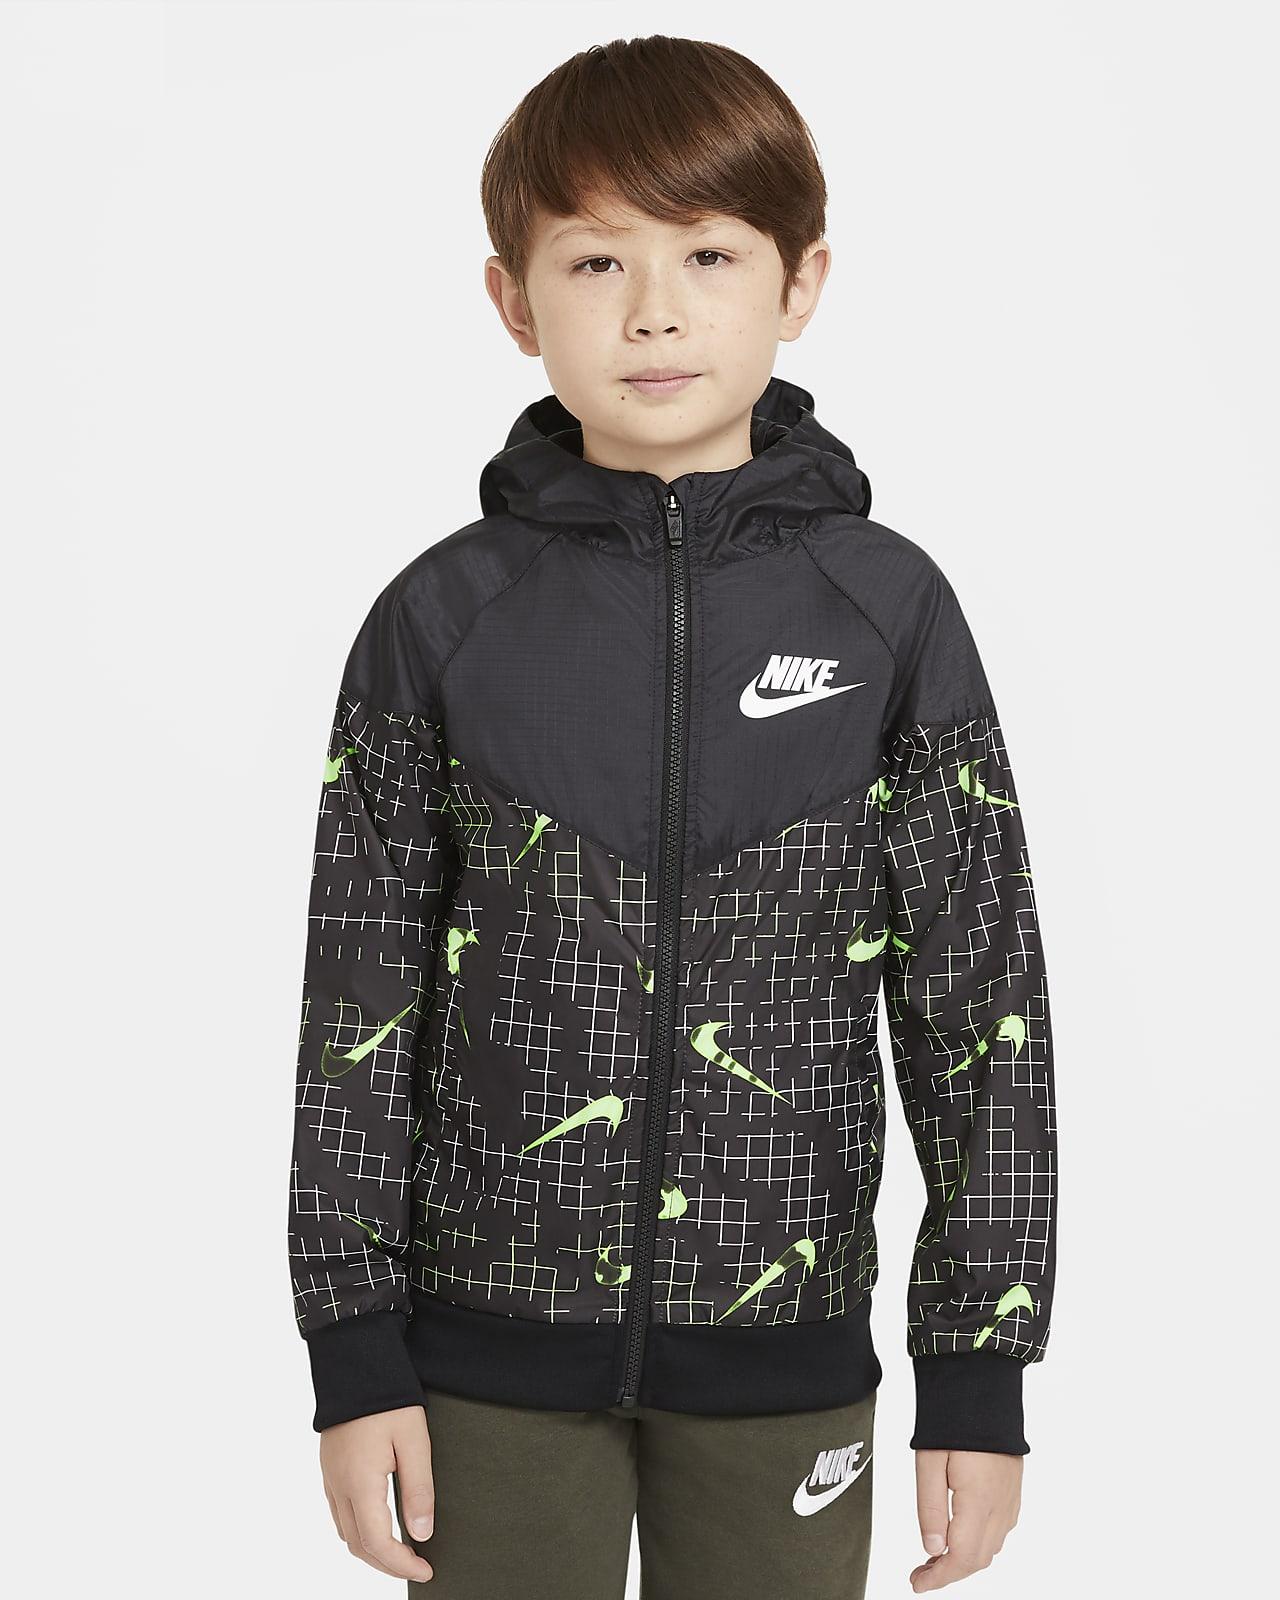 Куртка для мальчиков школьного возраста Nike Sportswear Windrunner